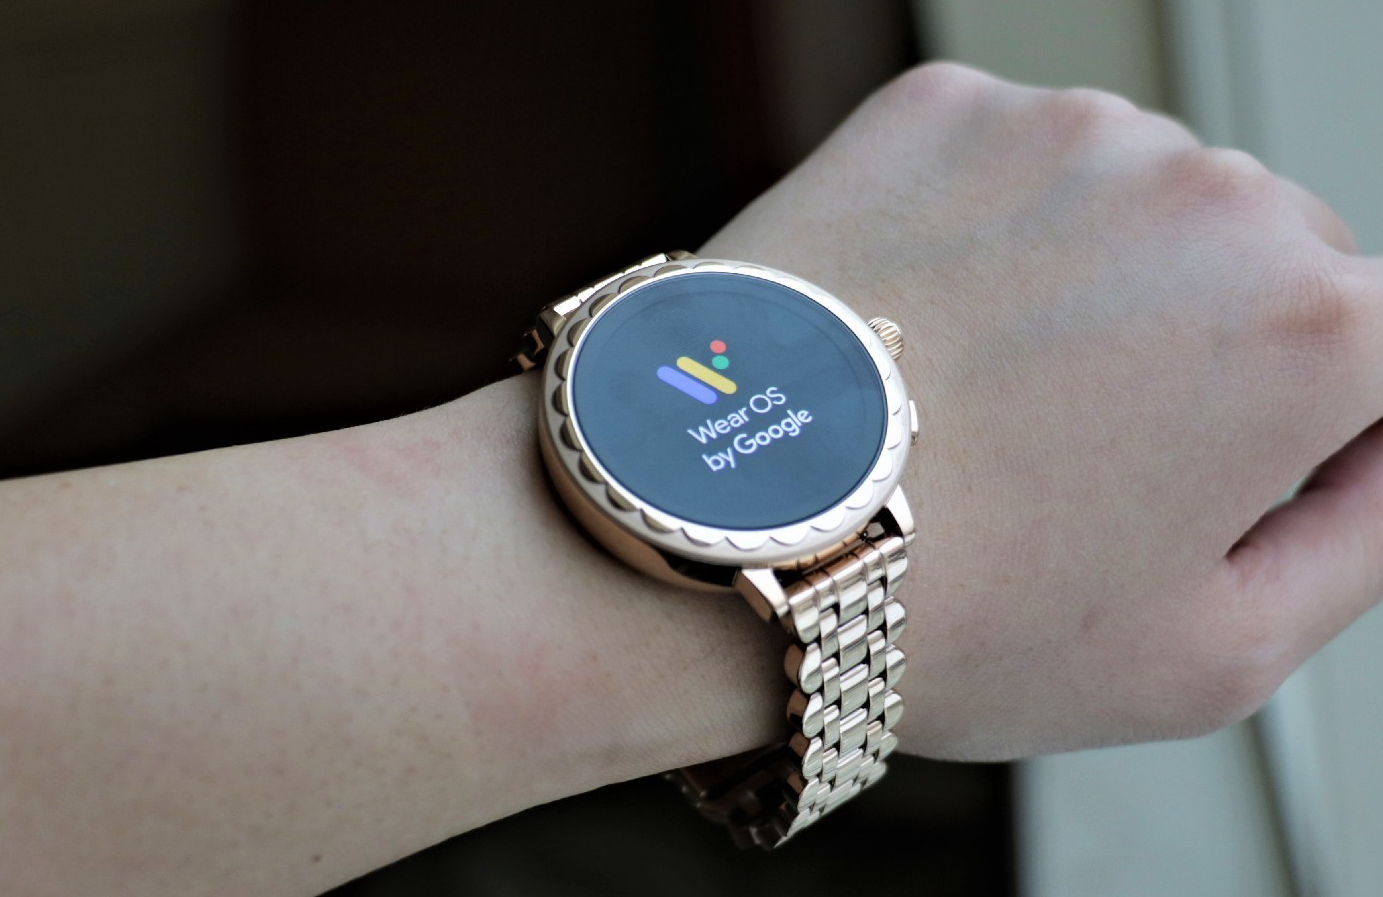 kate-spade-scallop-smartwatch-2-ces2019